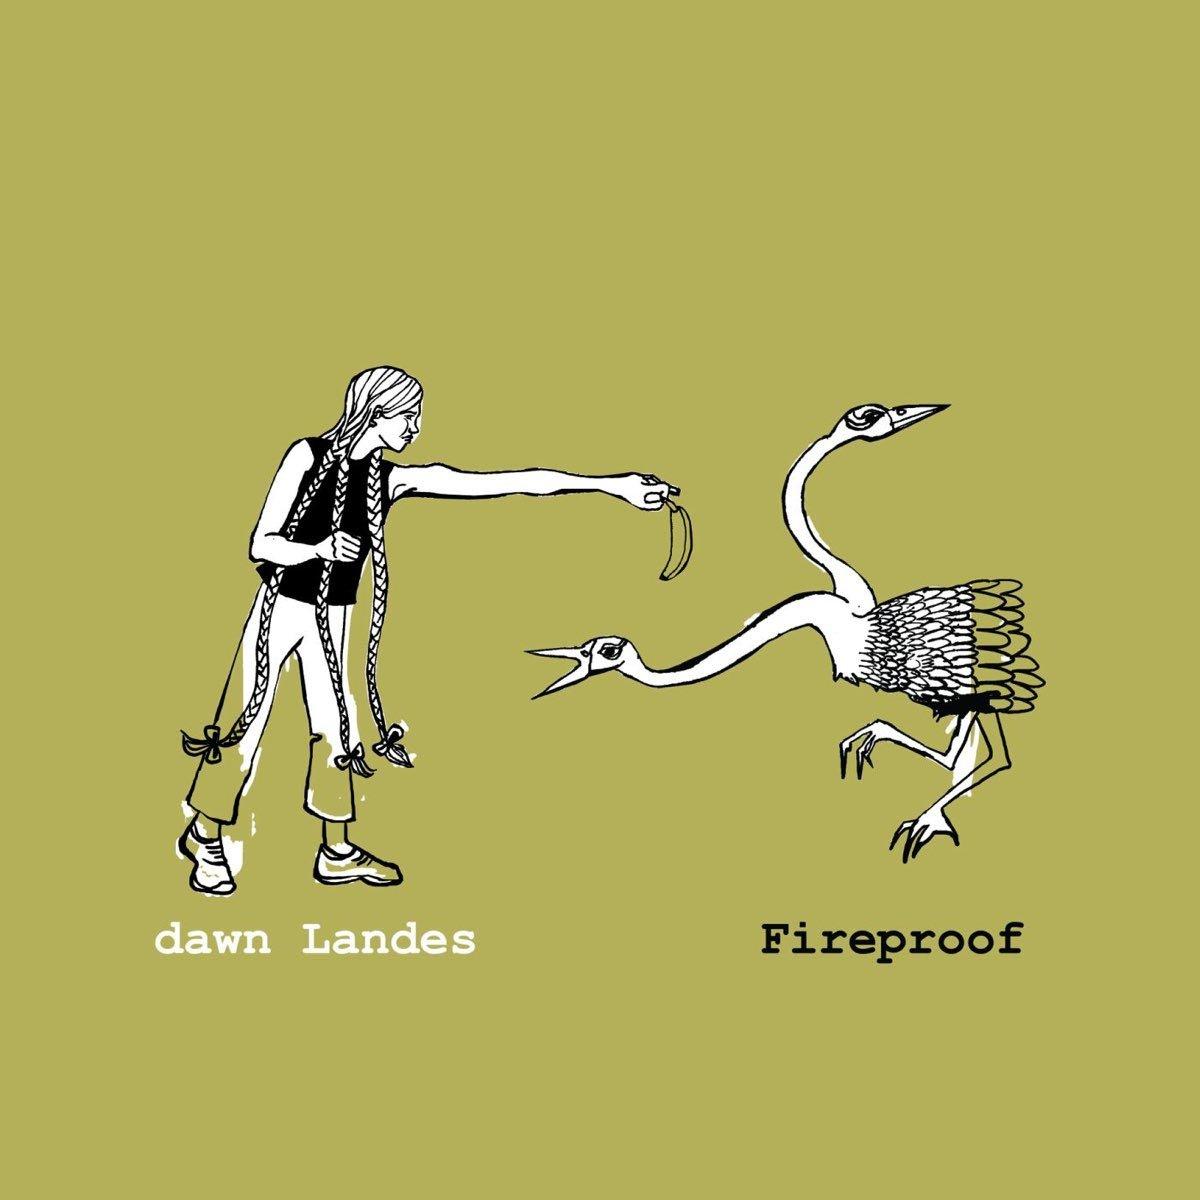 Dawn Landes, Fireproof